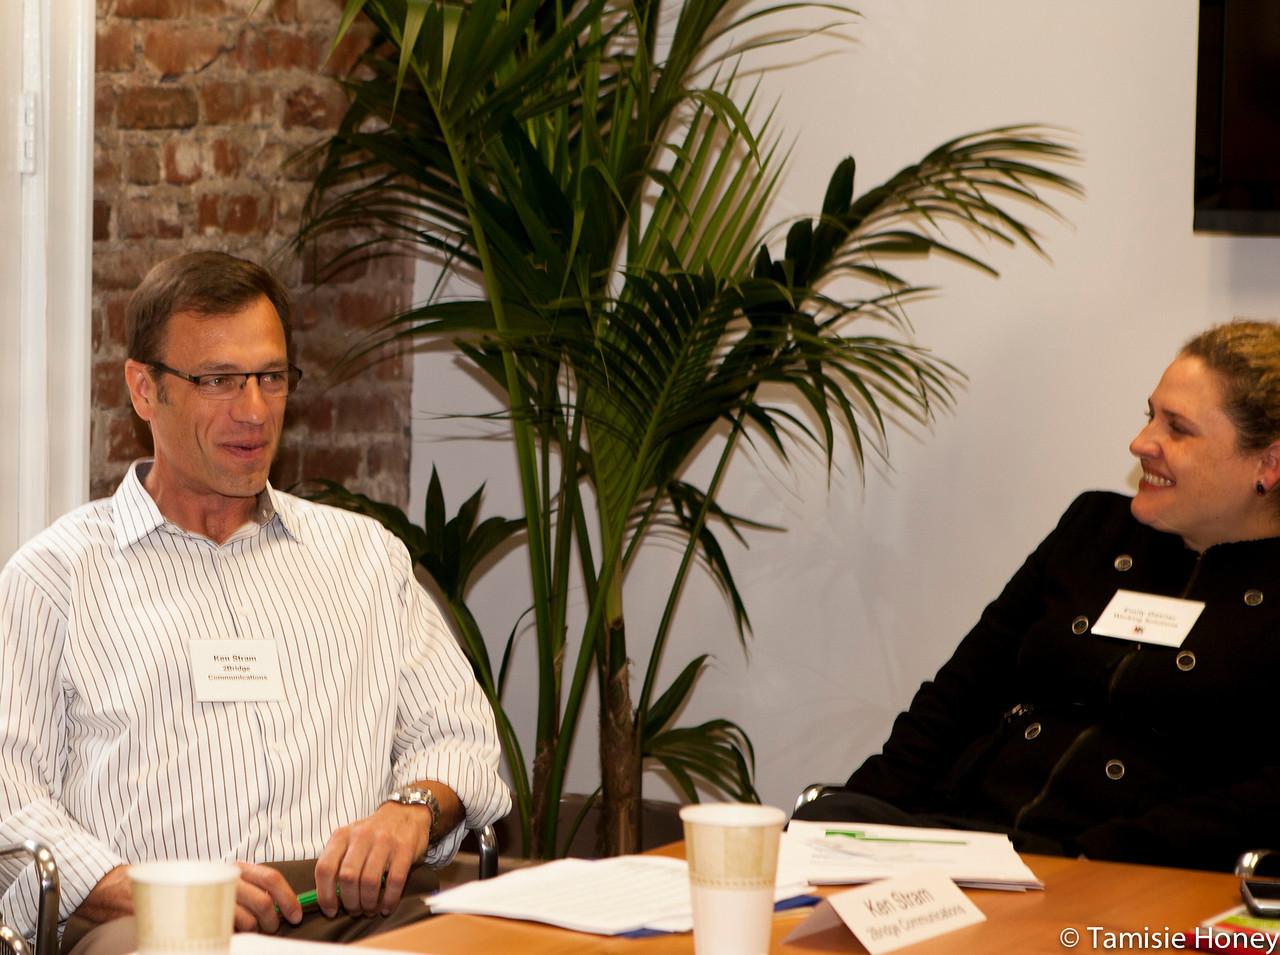 PR_Panel_meeting_with_entrepreneurs-24